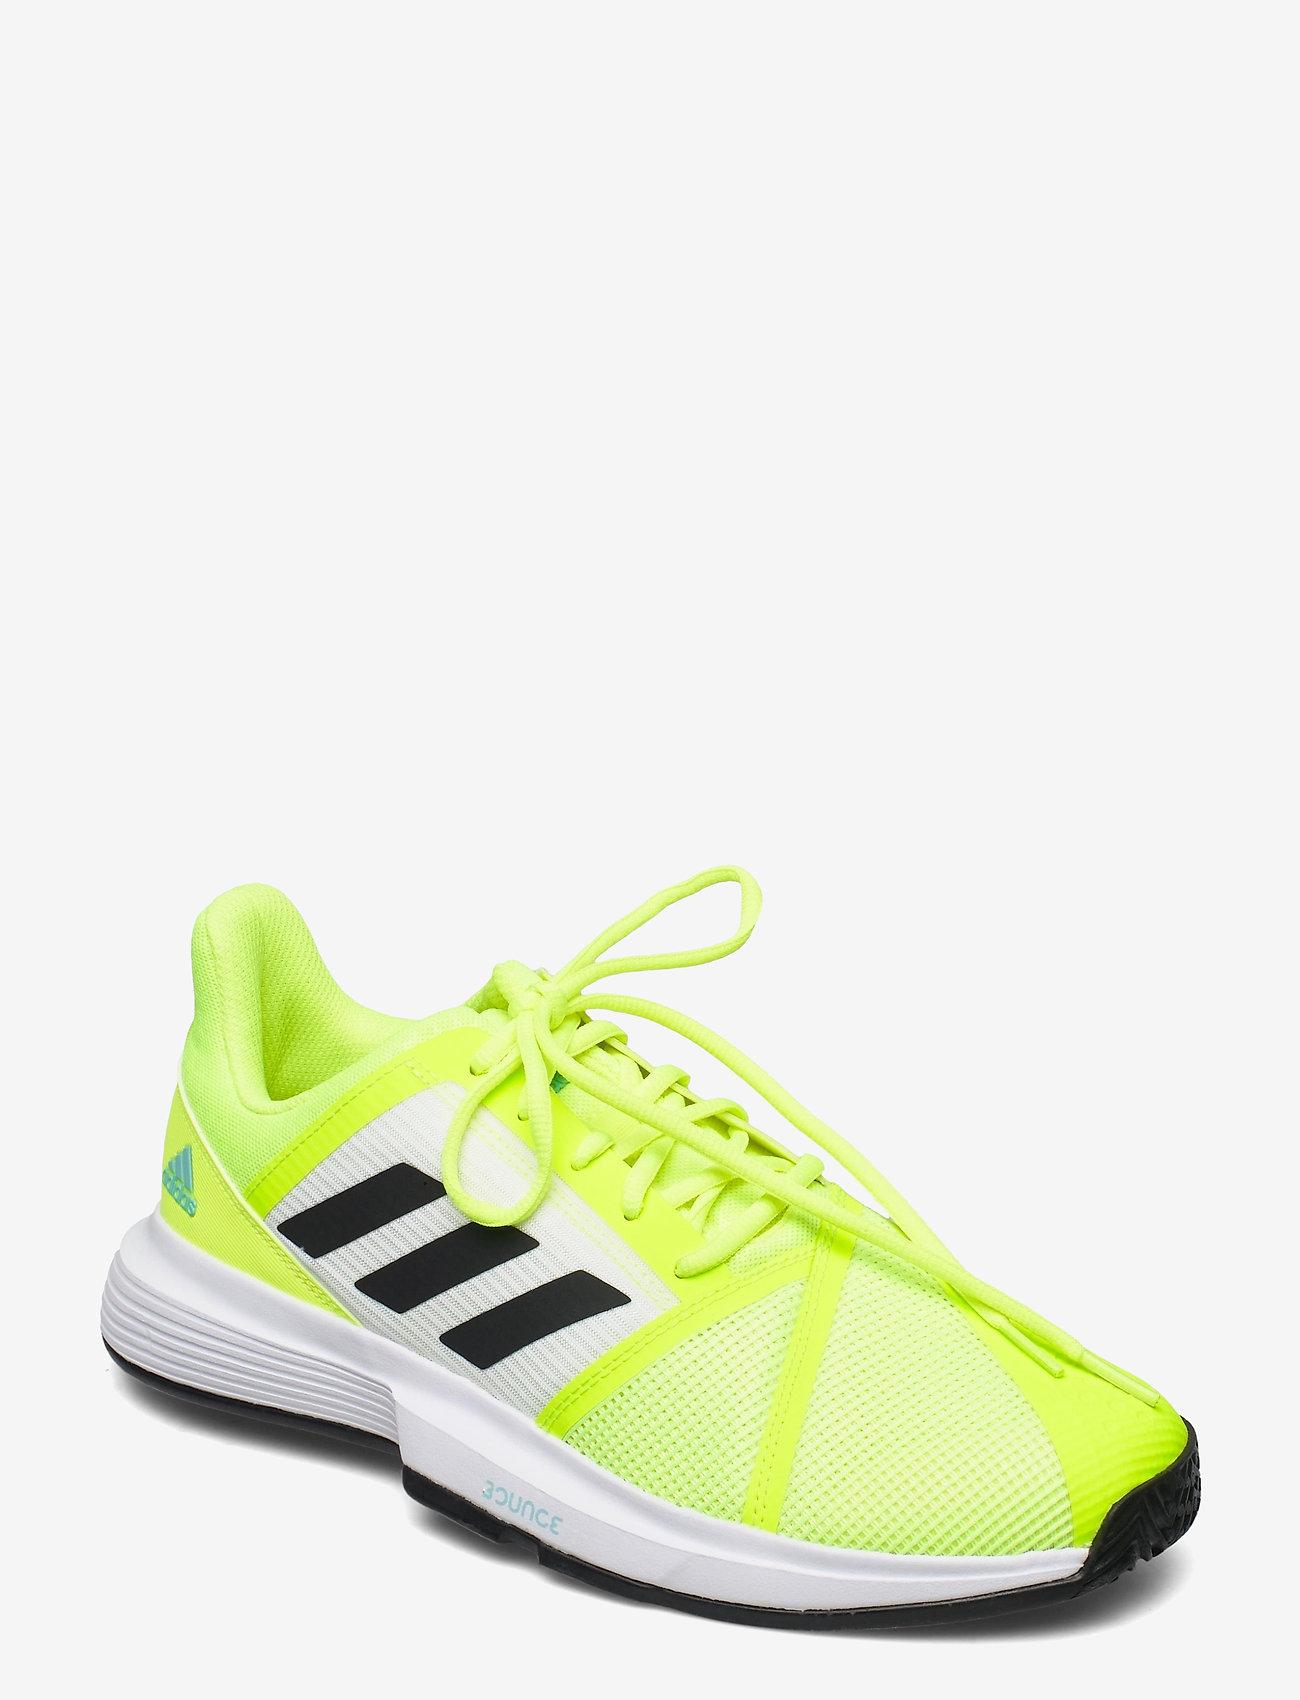 adidas Performance - COURTJAM BOUNCE M - ketsjersportsko - yellow - 0